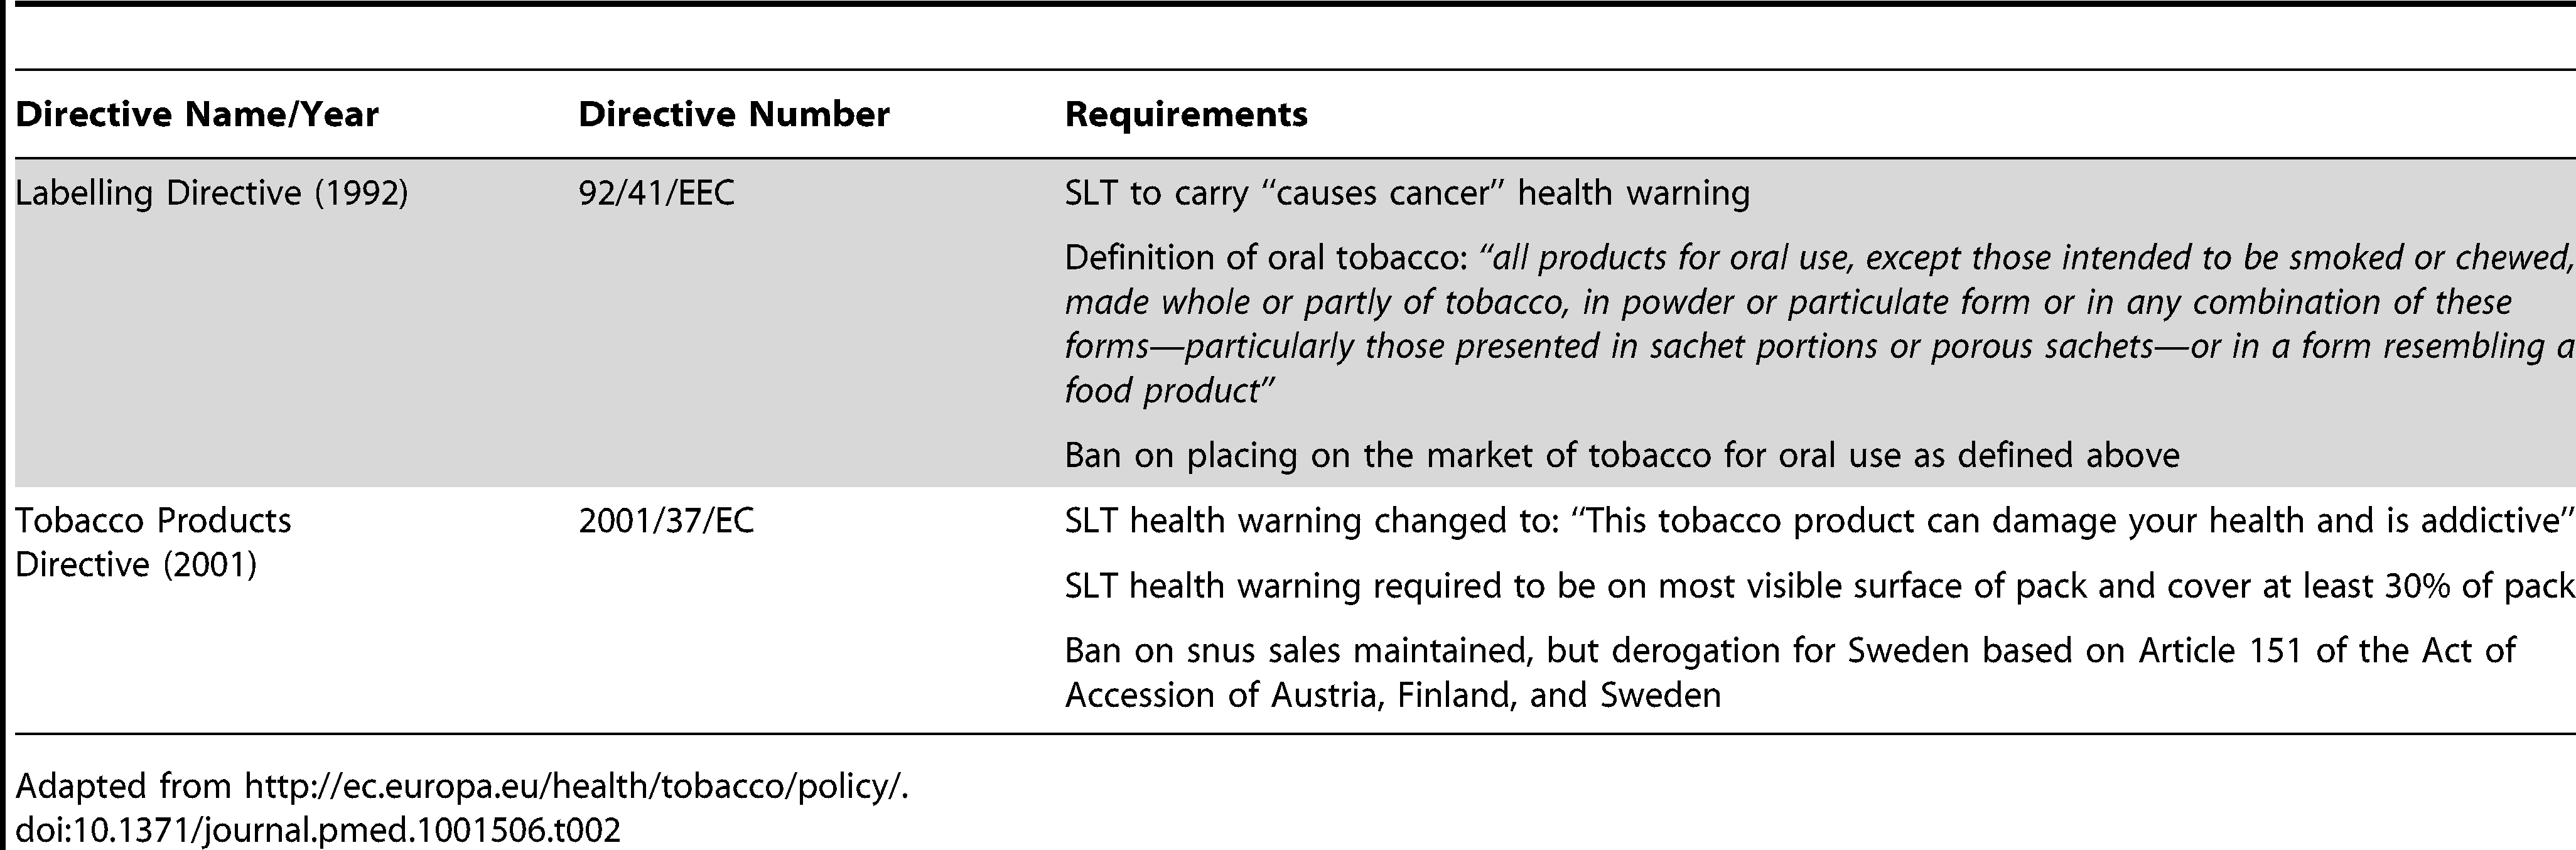 EU Tobacco Control Directives specifically addressing SLT.